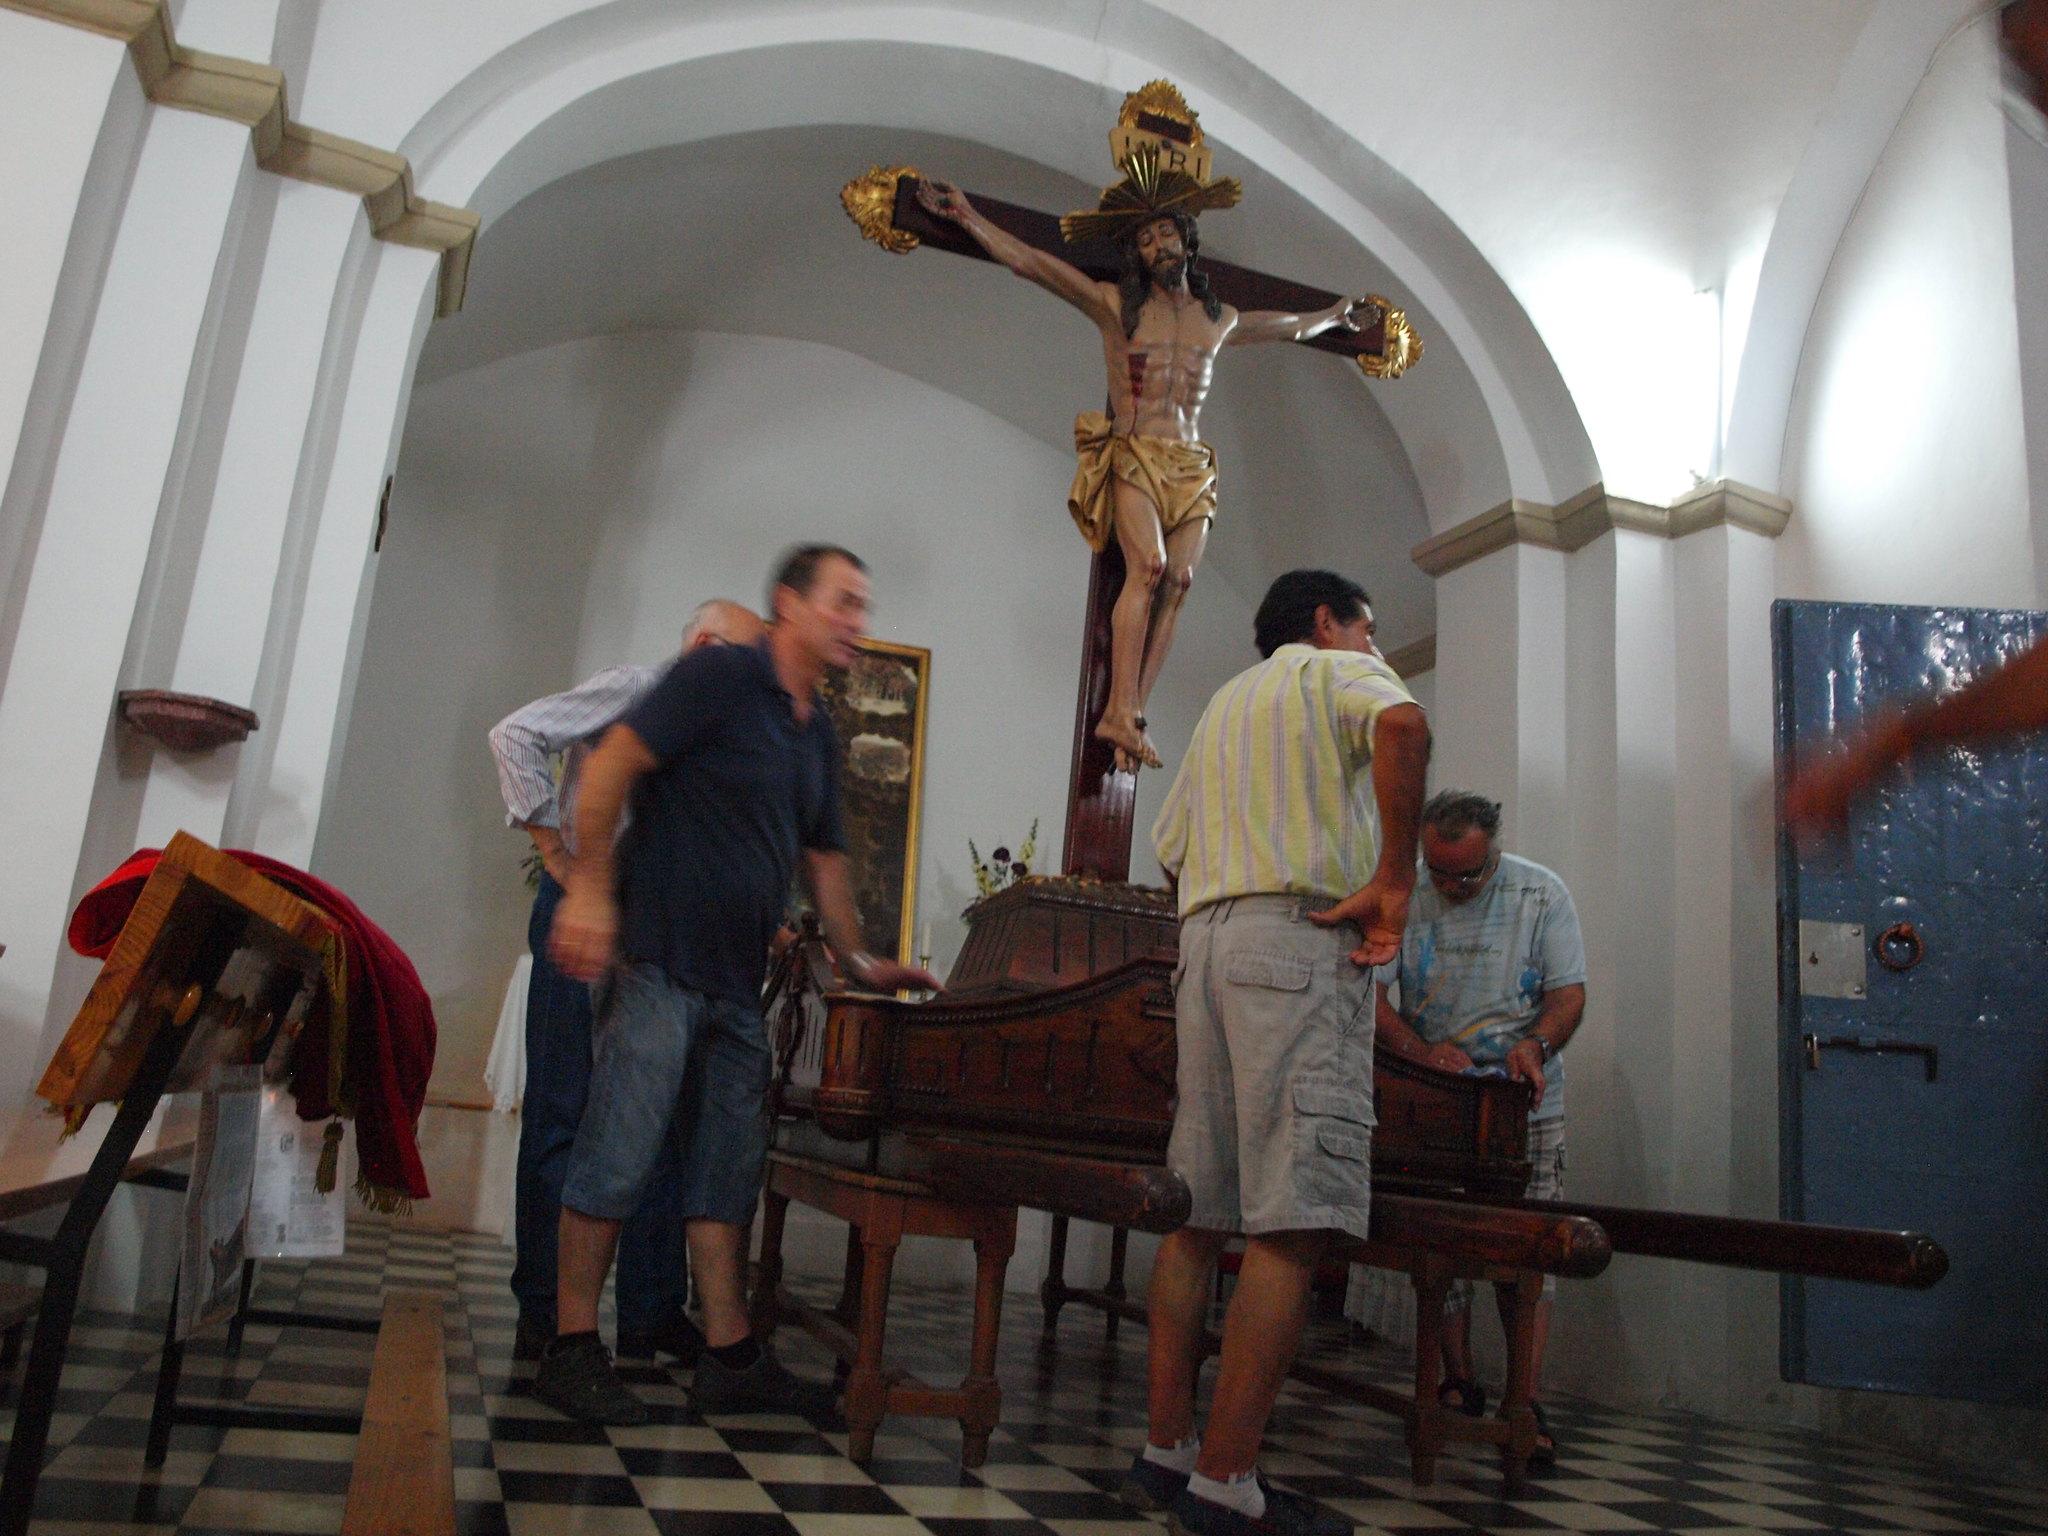 (2014-07-07) - Recogida de Imagen - Paloma Romero Torralba (20)